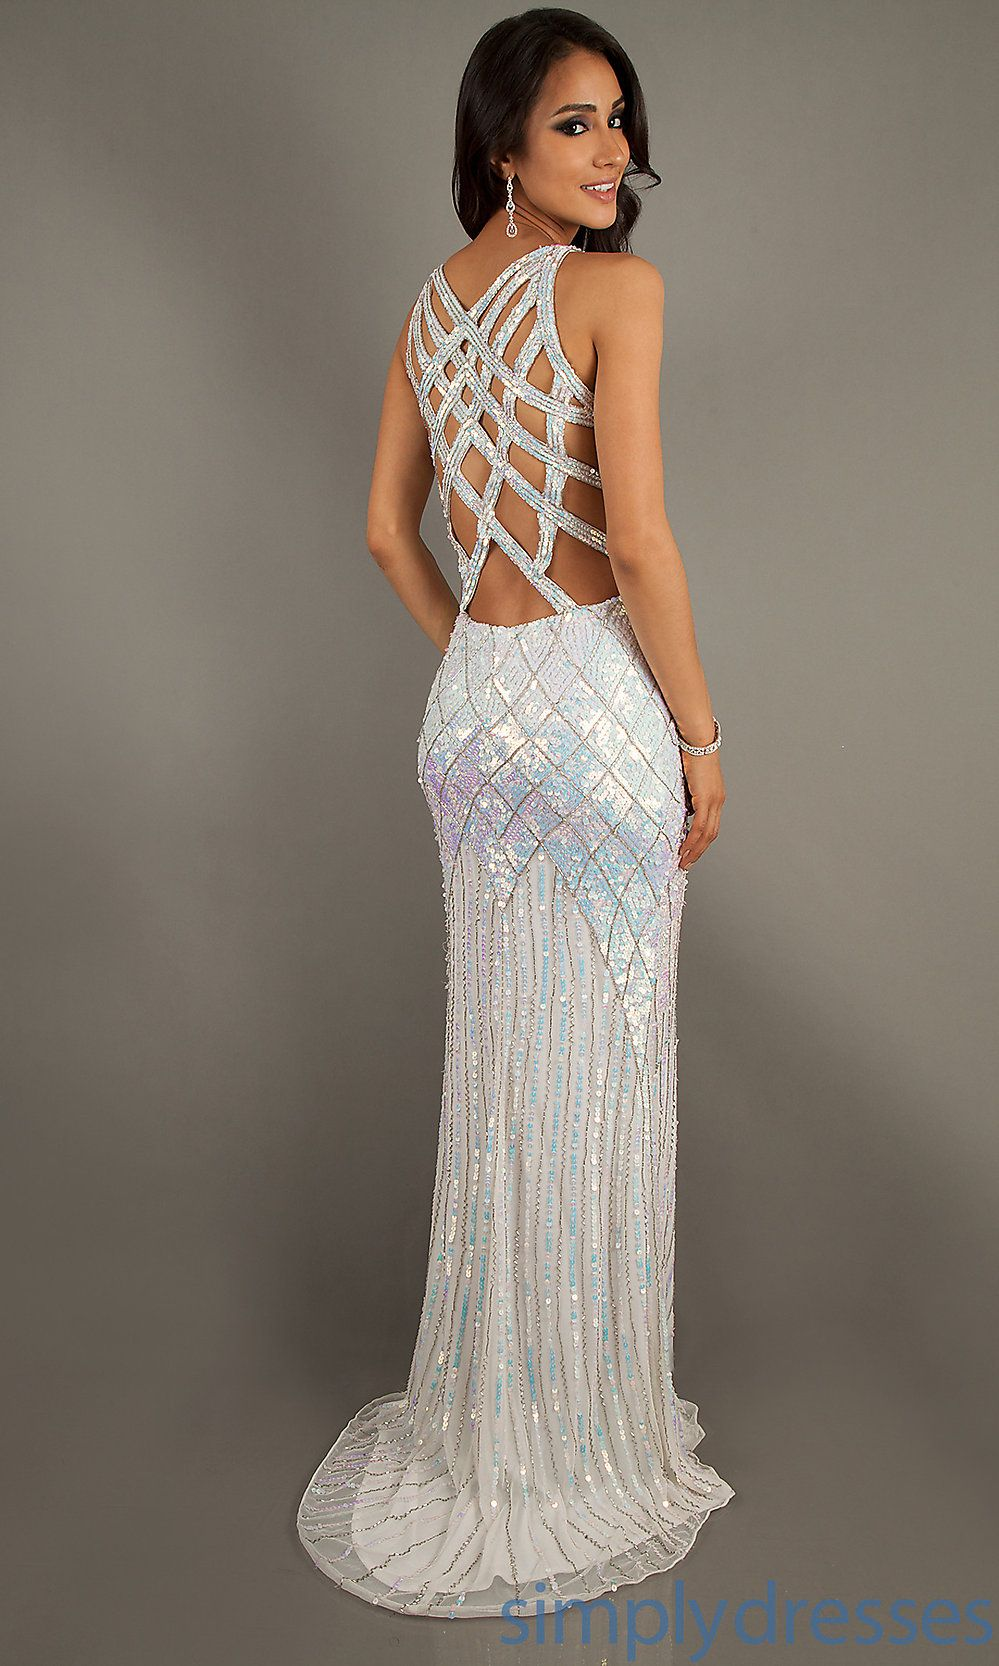 Long sequin primavera formal prom dress simply dresses prom